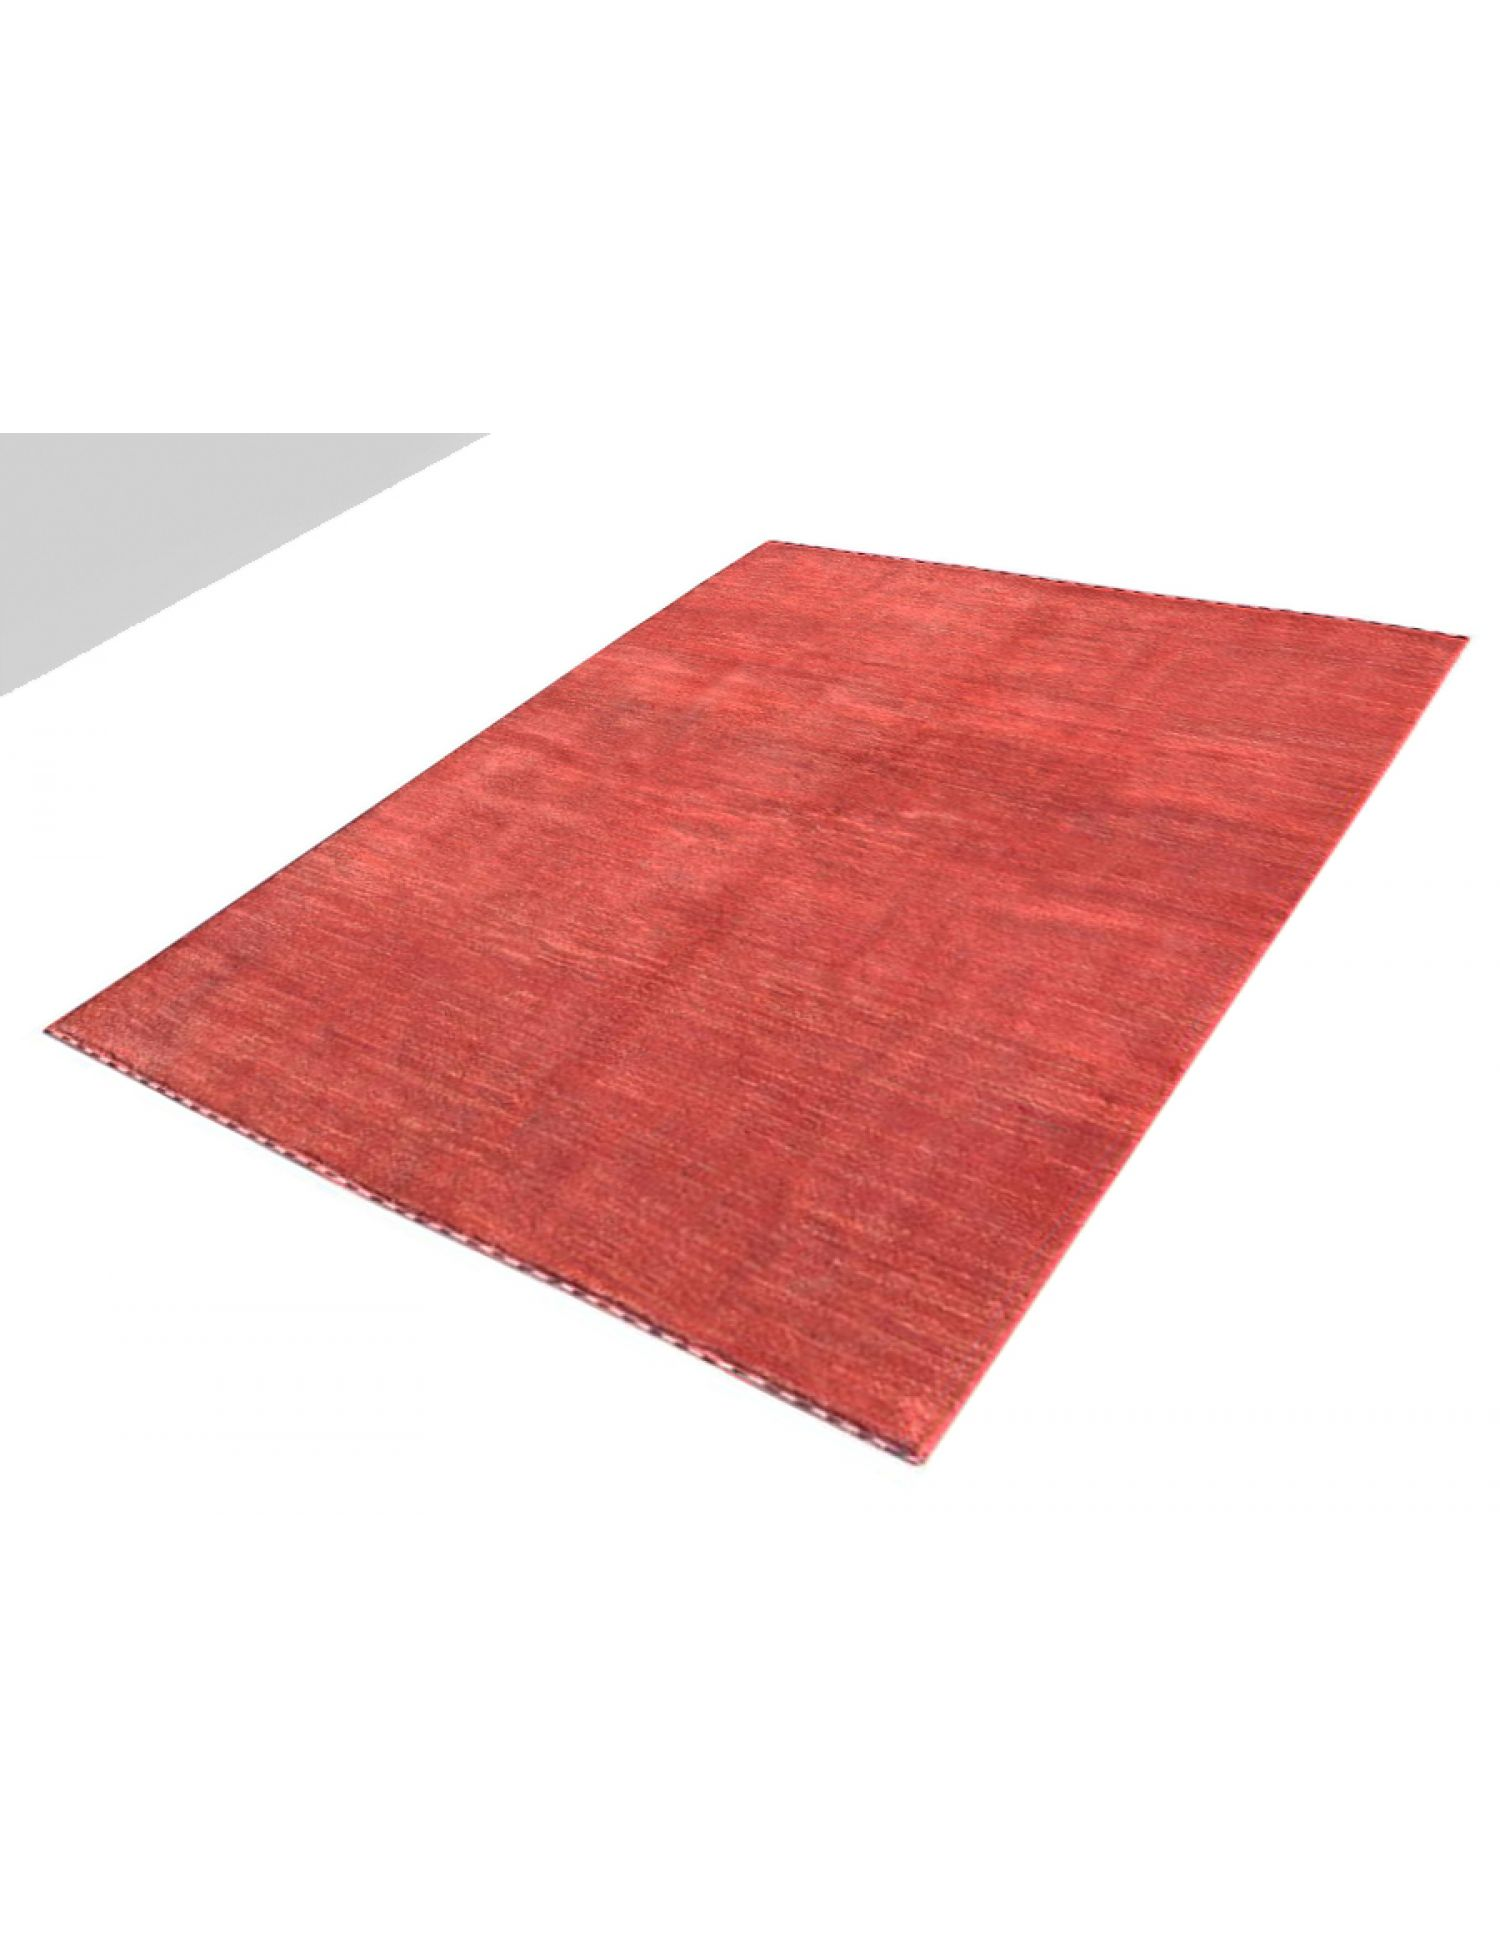 Moderne Teppiche  rot <br/>123 x 123 cm